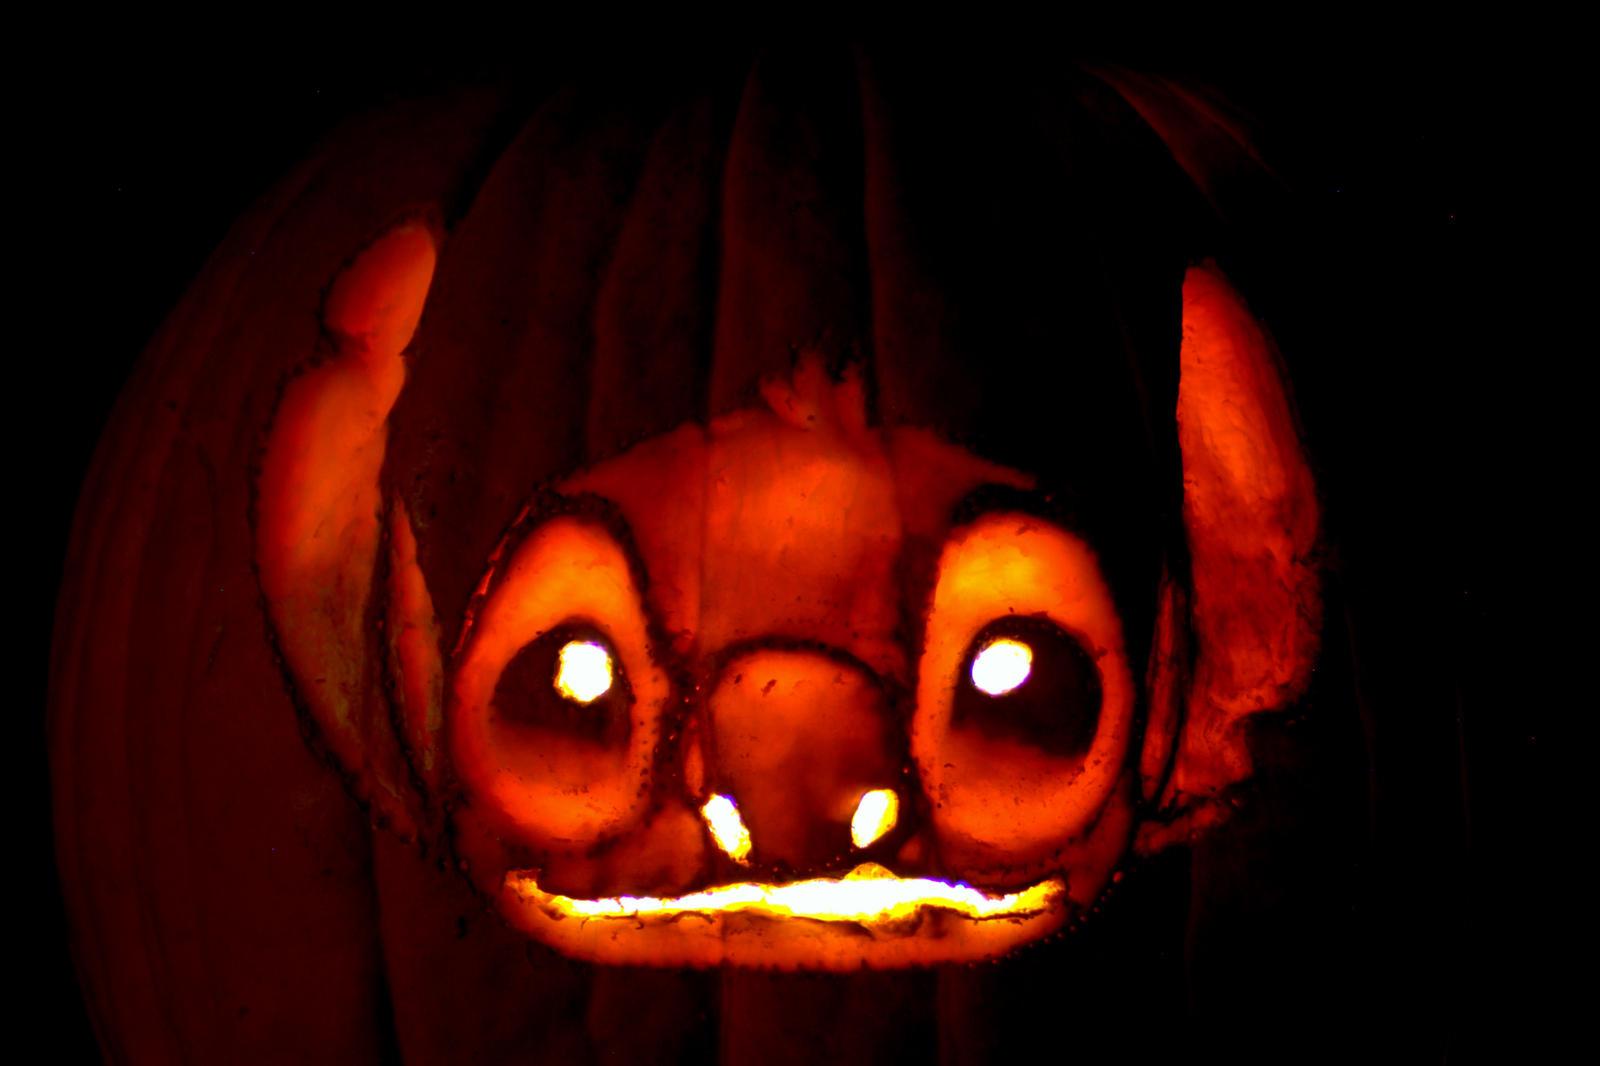 626 Stitch Pumpkin Carving by chris-p-nugget on DeviantArt